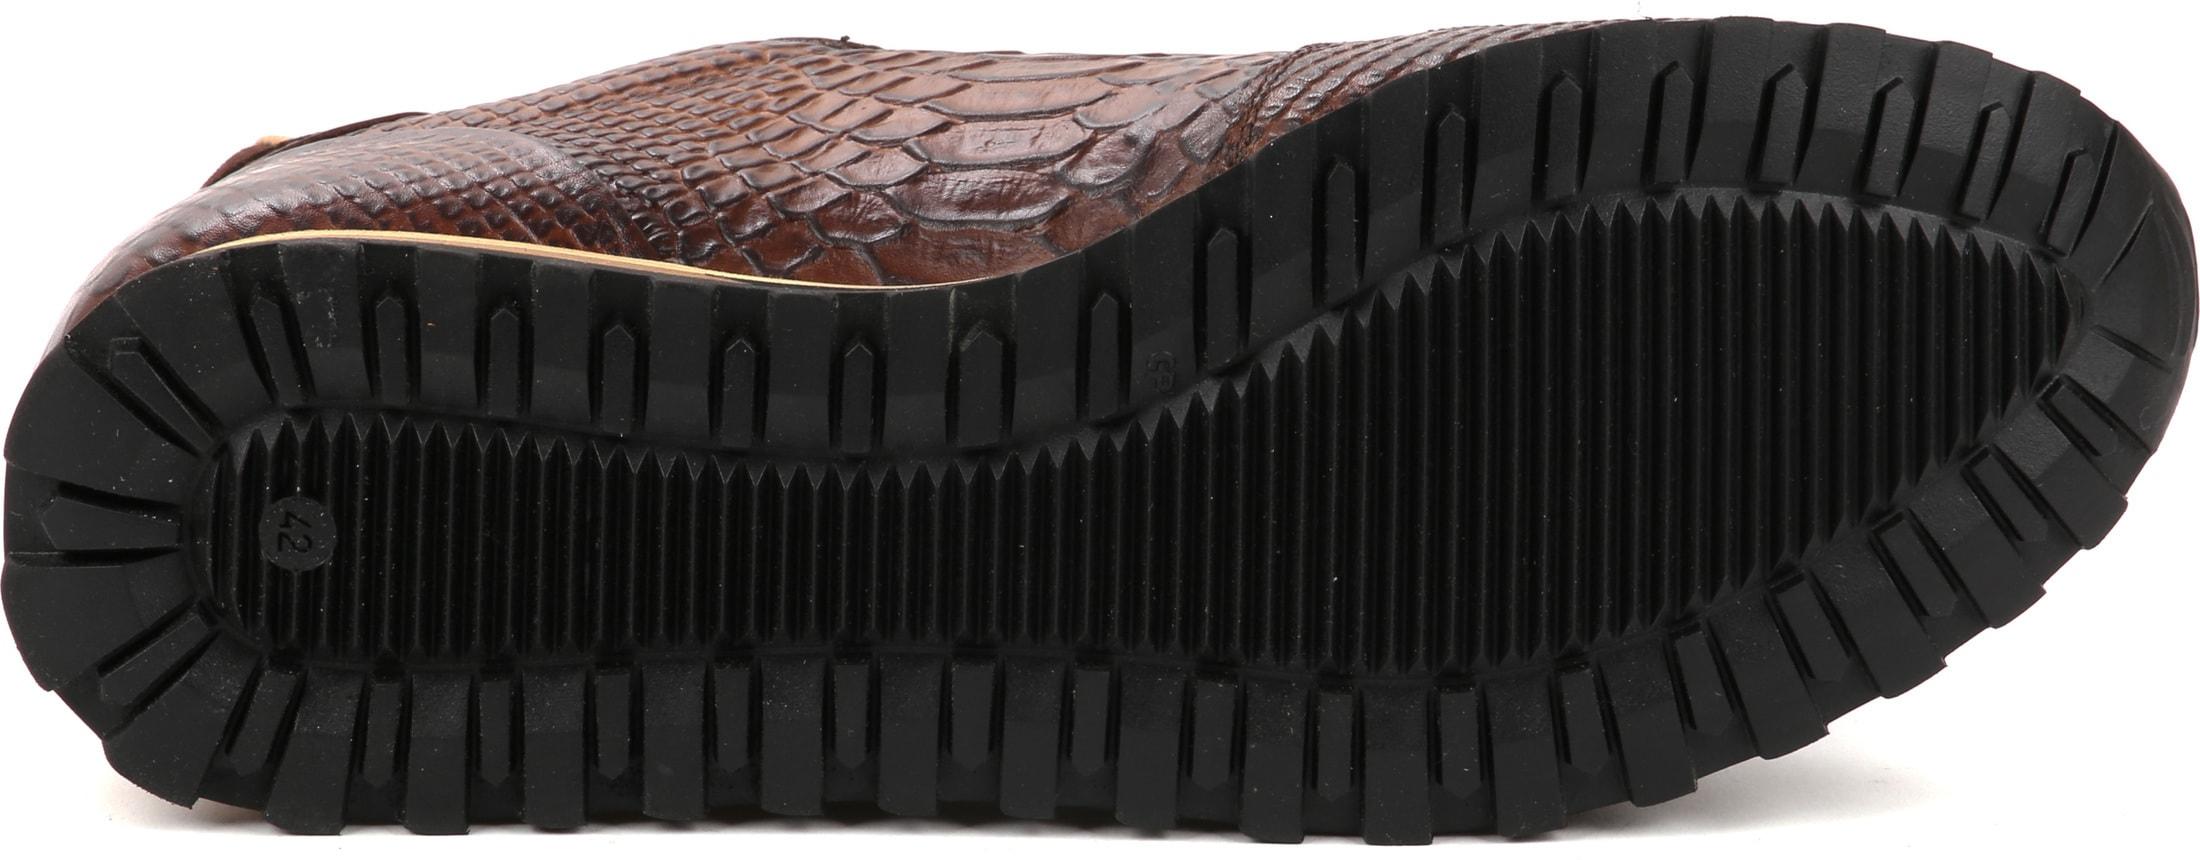 Giorgio Sneaker Anaconda Cognac foto 3